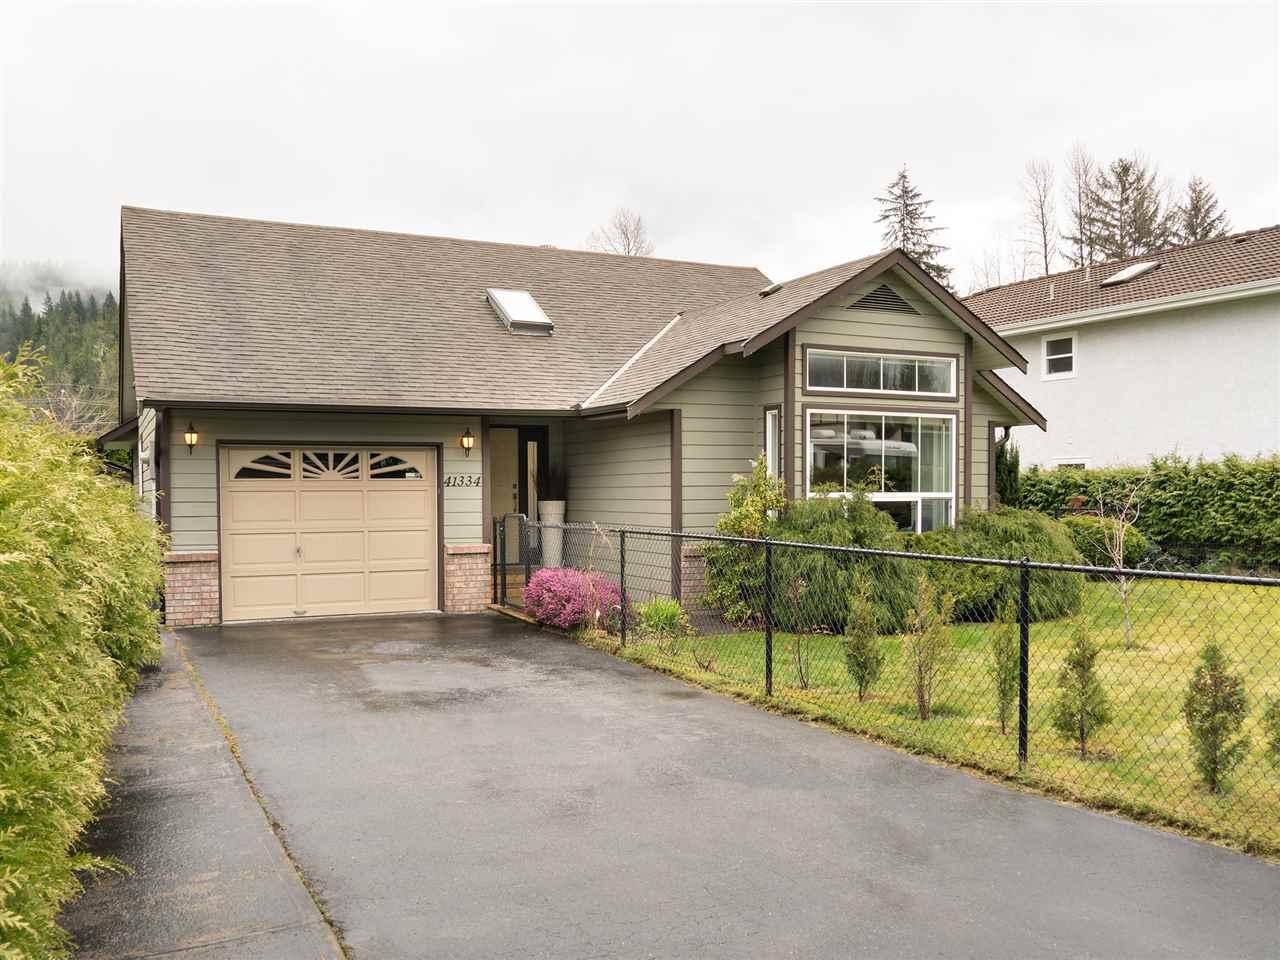 41334 KINGSWOOD ROAD, Squamish, BC, V8B 0B1 Primary Photo